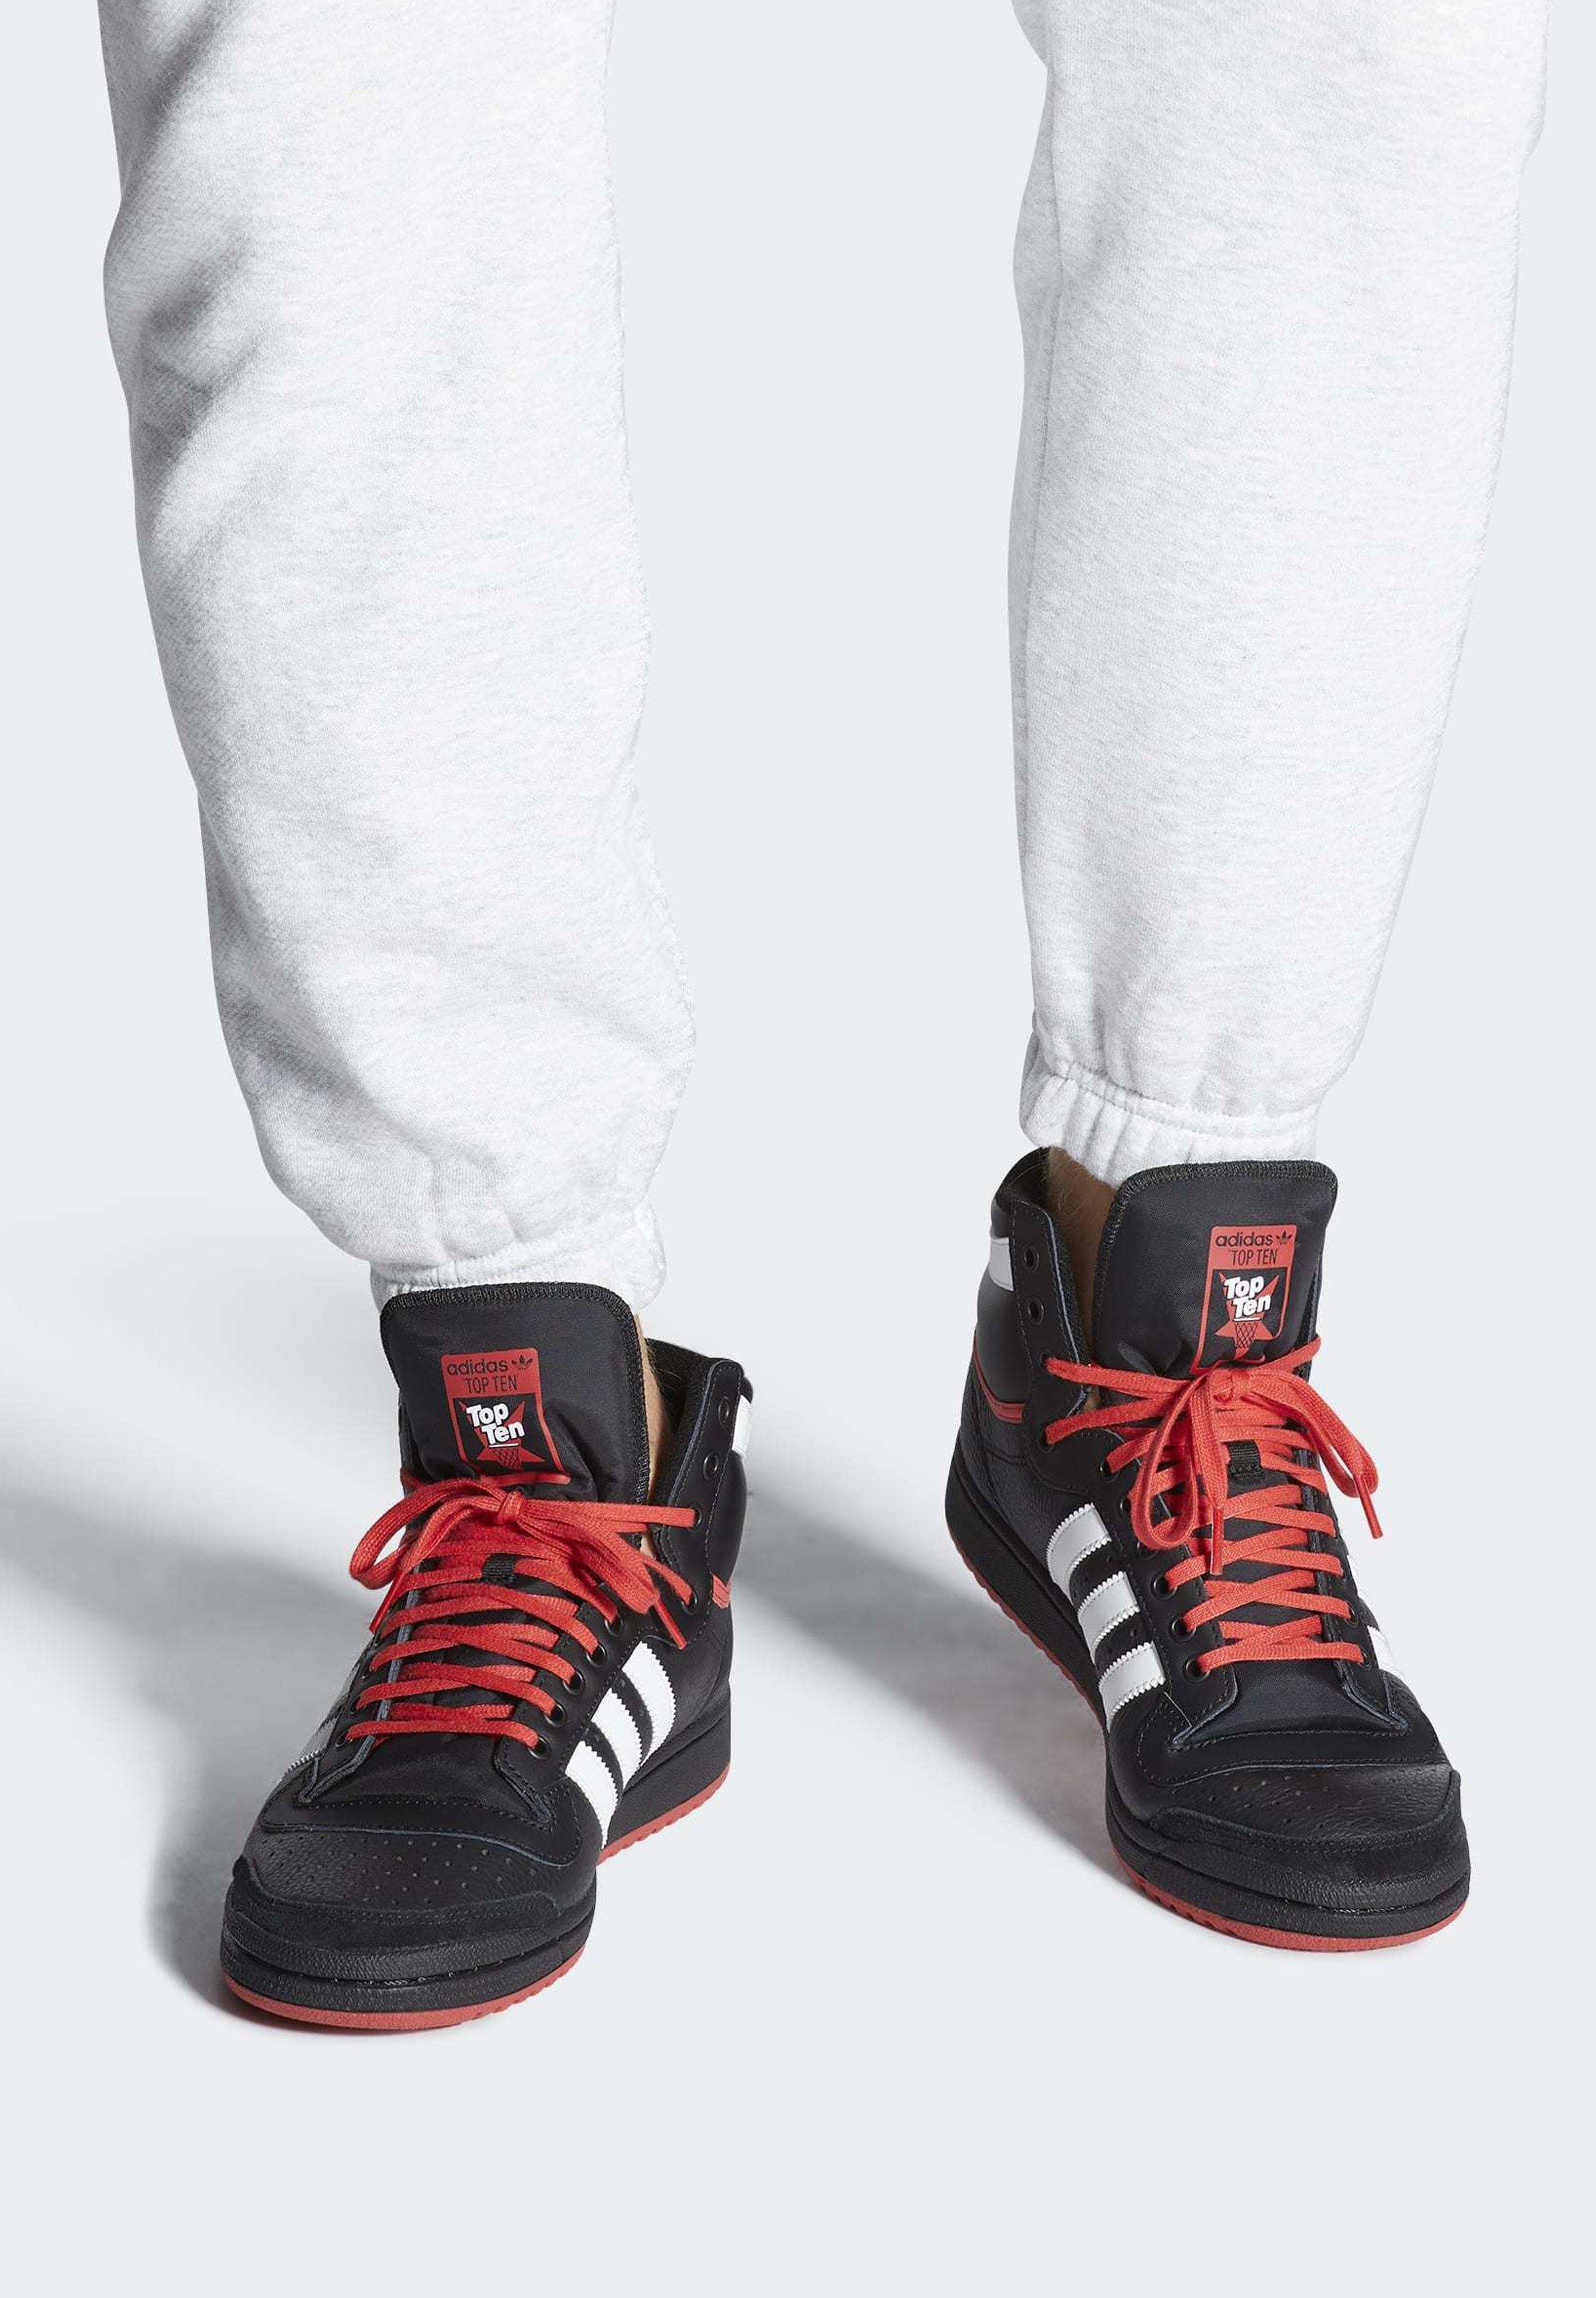 adidas originals TOP TEN HI neo whiteNEW NAVYcollegiate